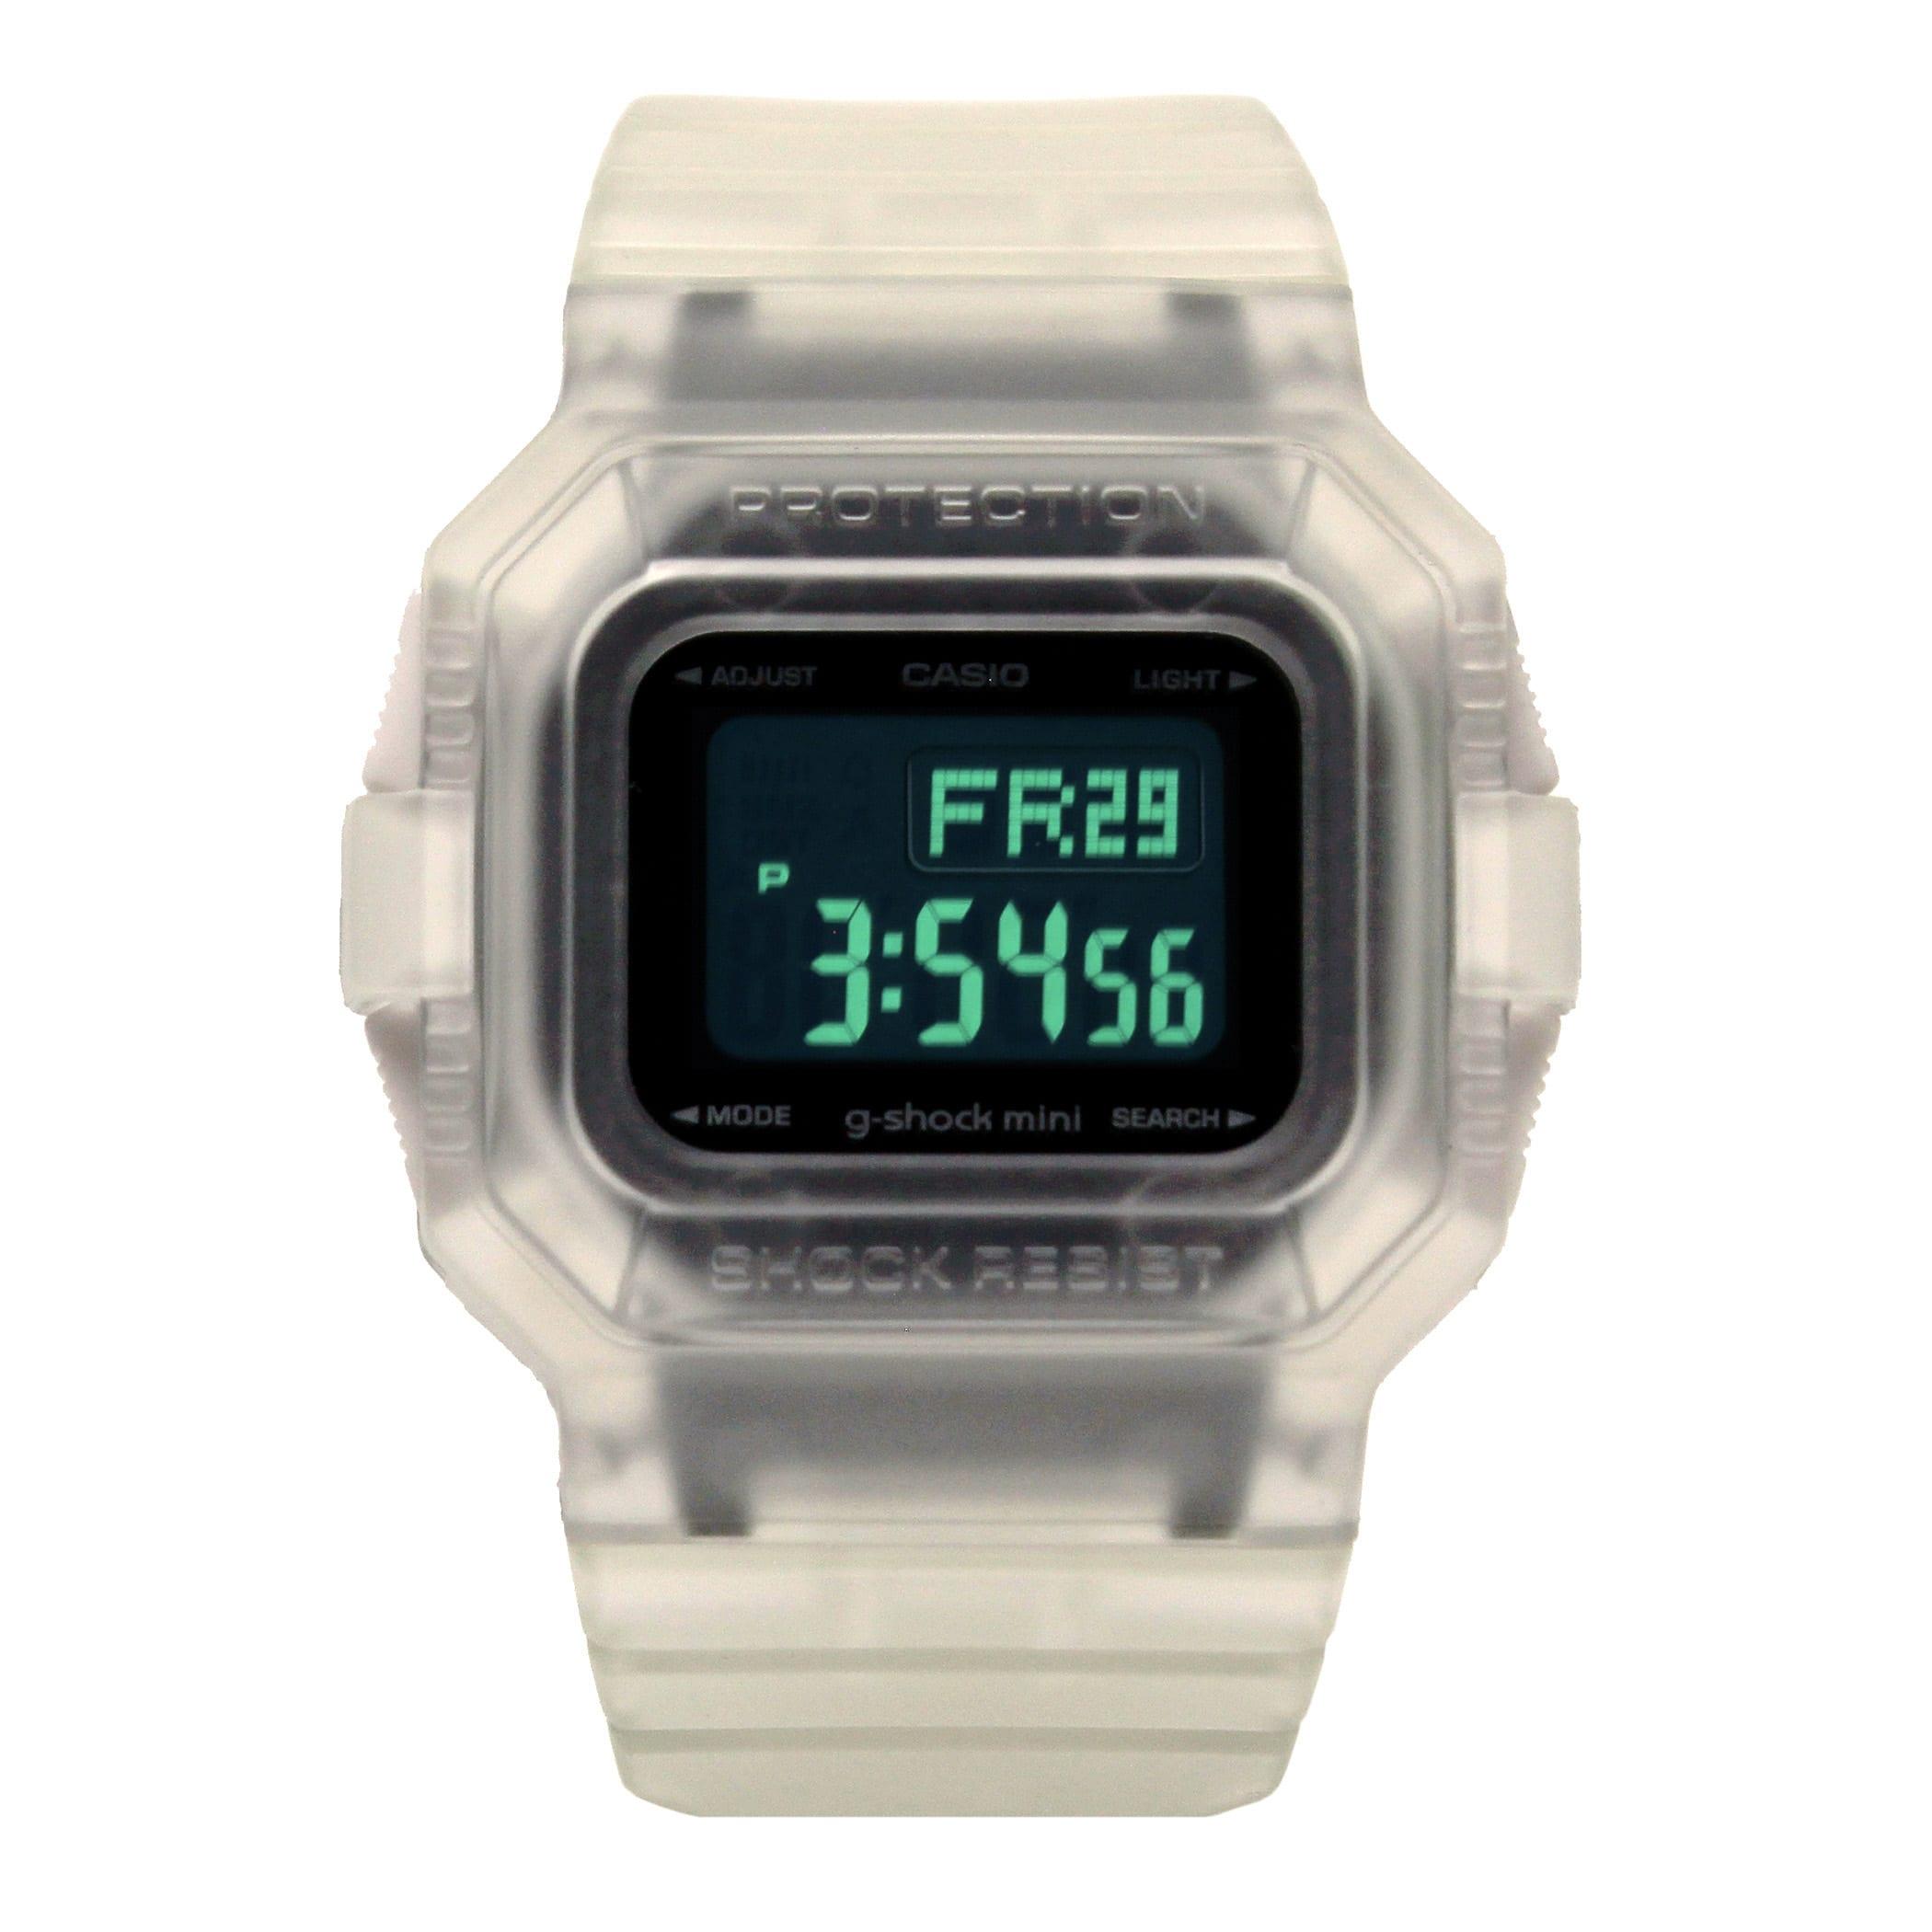 28603bf62e 「ビームス(BEAMS)」が、カシオ計算機の耐衝撃ウォッチ「Gショック(G-SHOCK )」の別注モデル(1万5,000円)を発売する。価格は1万5,000円。5月24日に予約を開始 ...